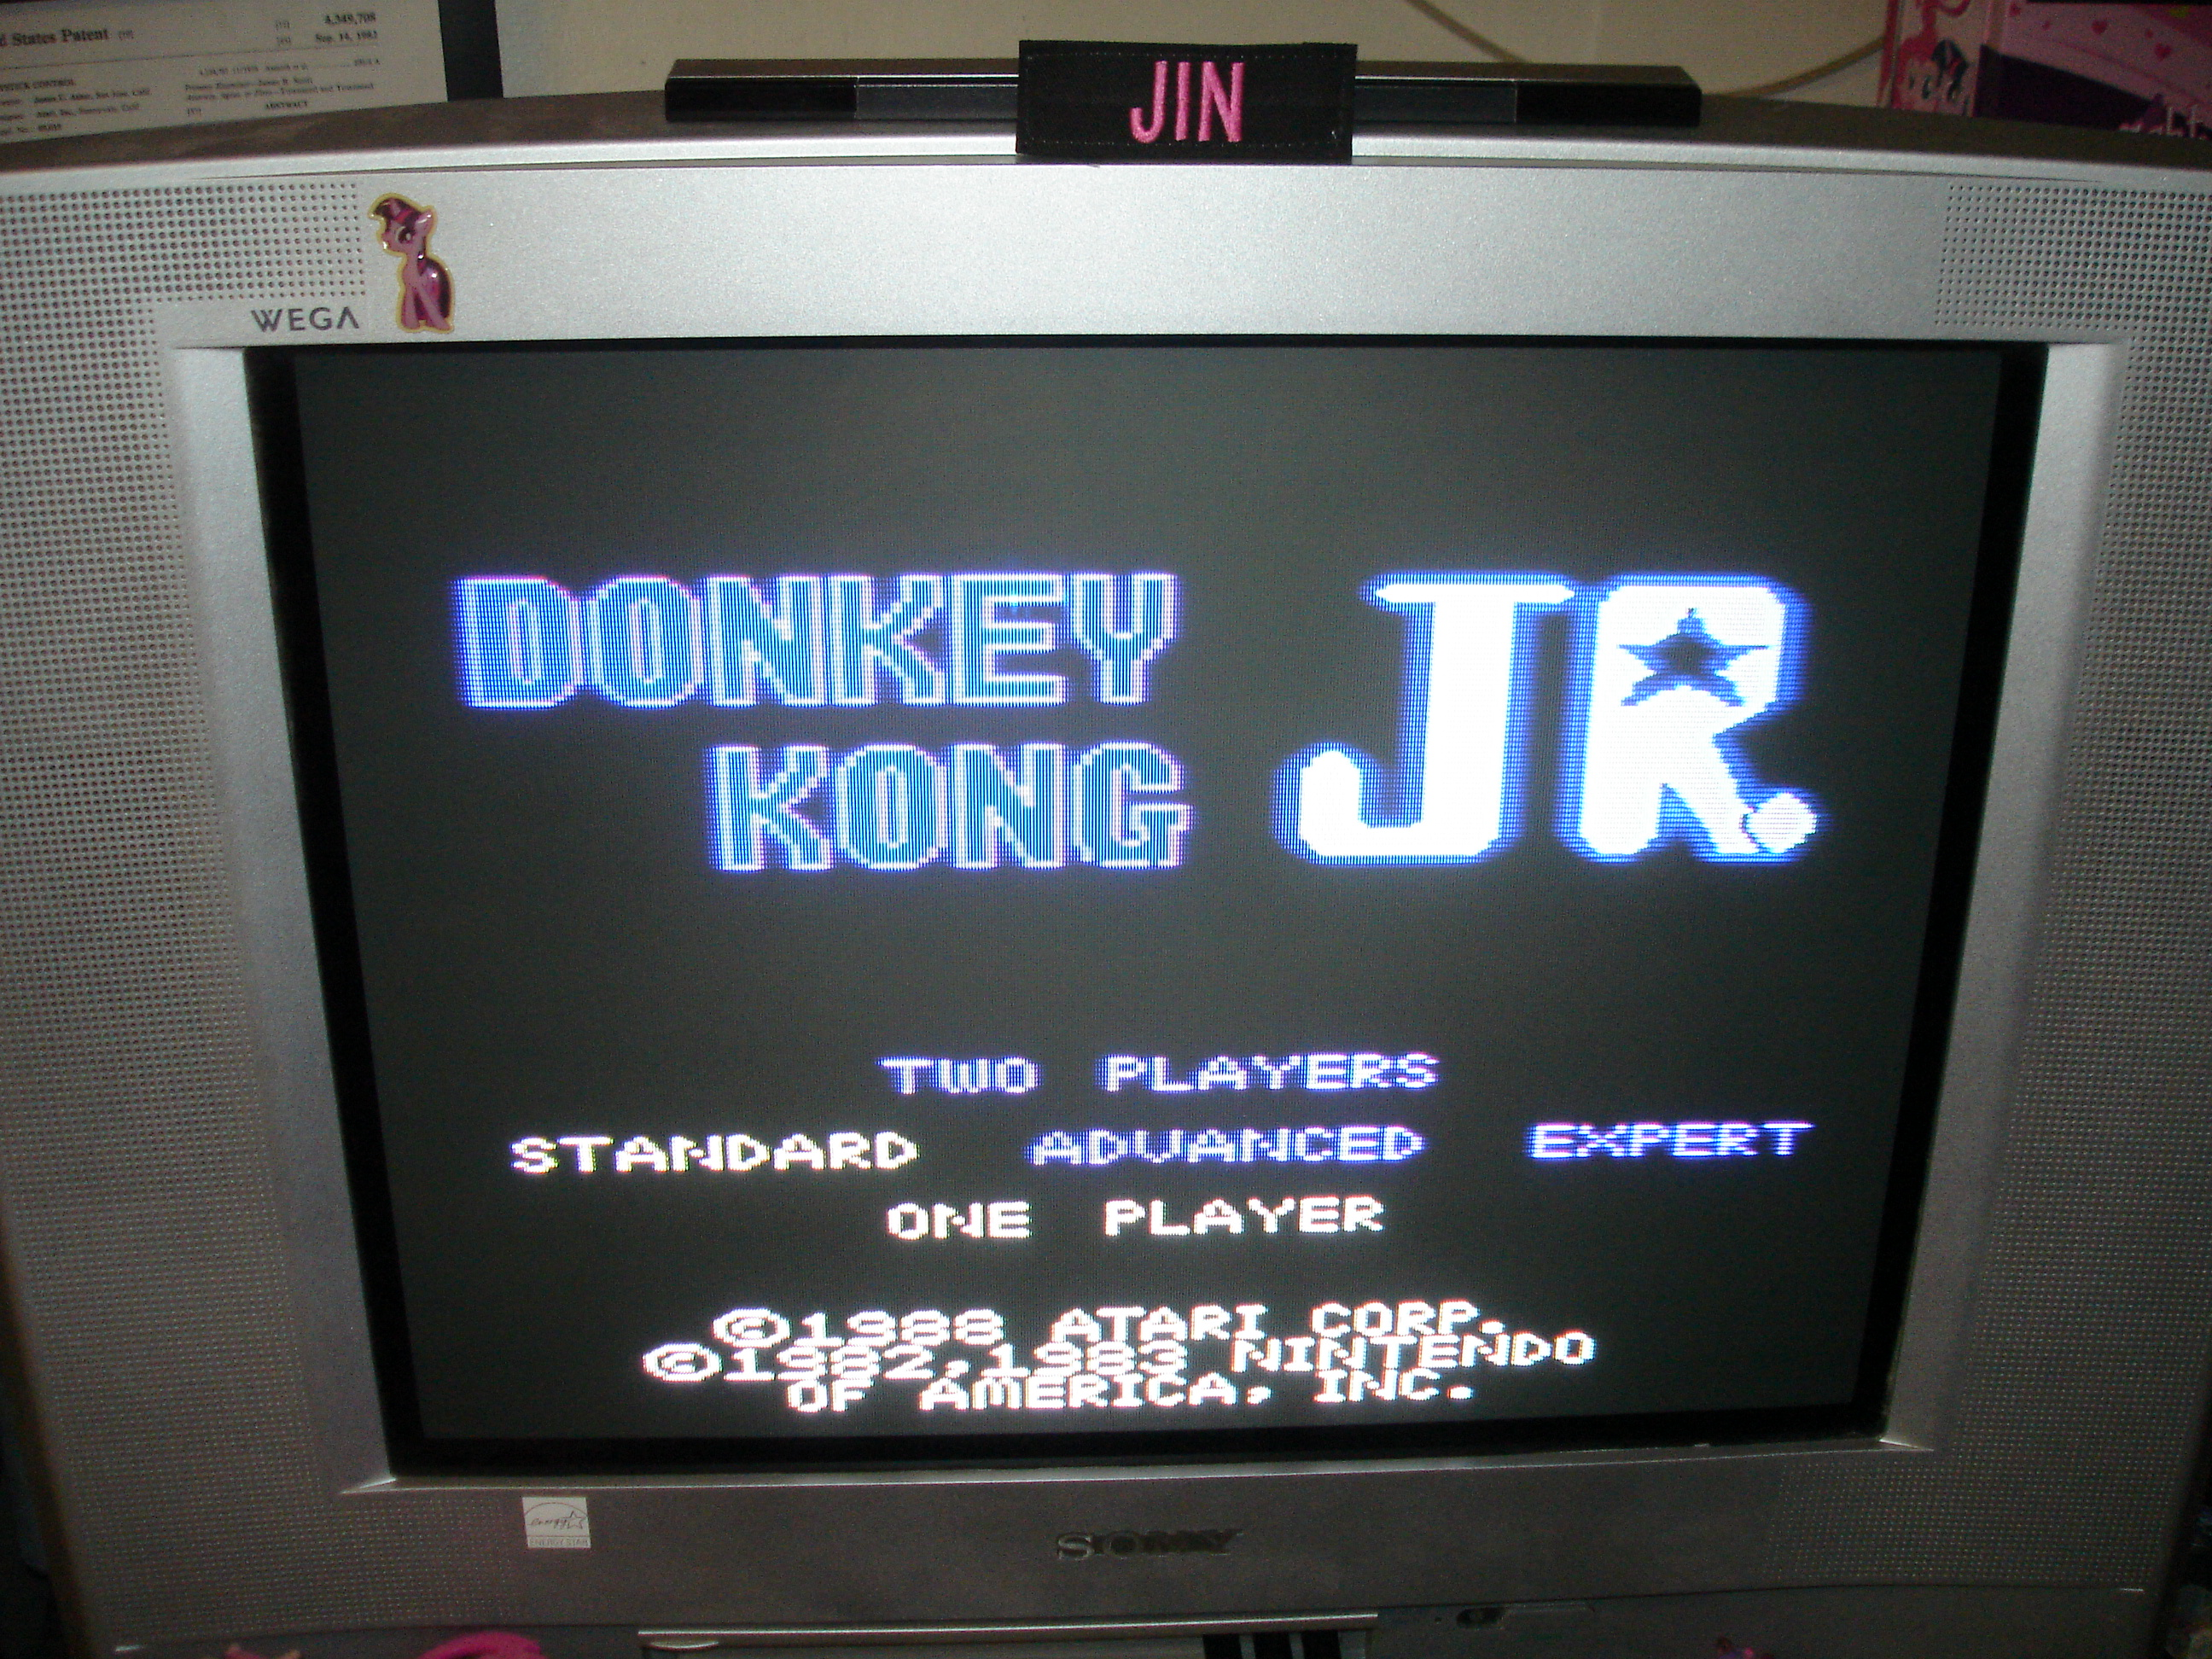 Donkey Kong Jr: Standard 142,900 points